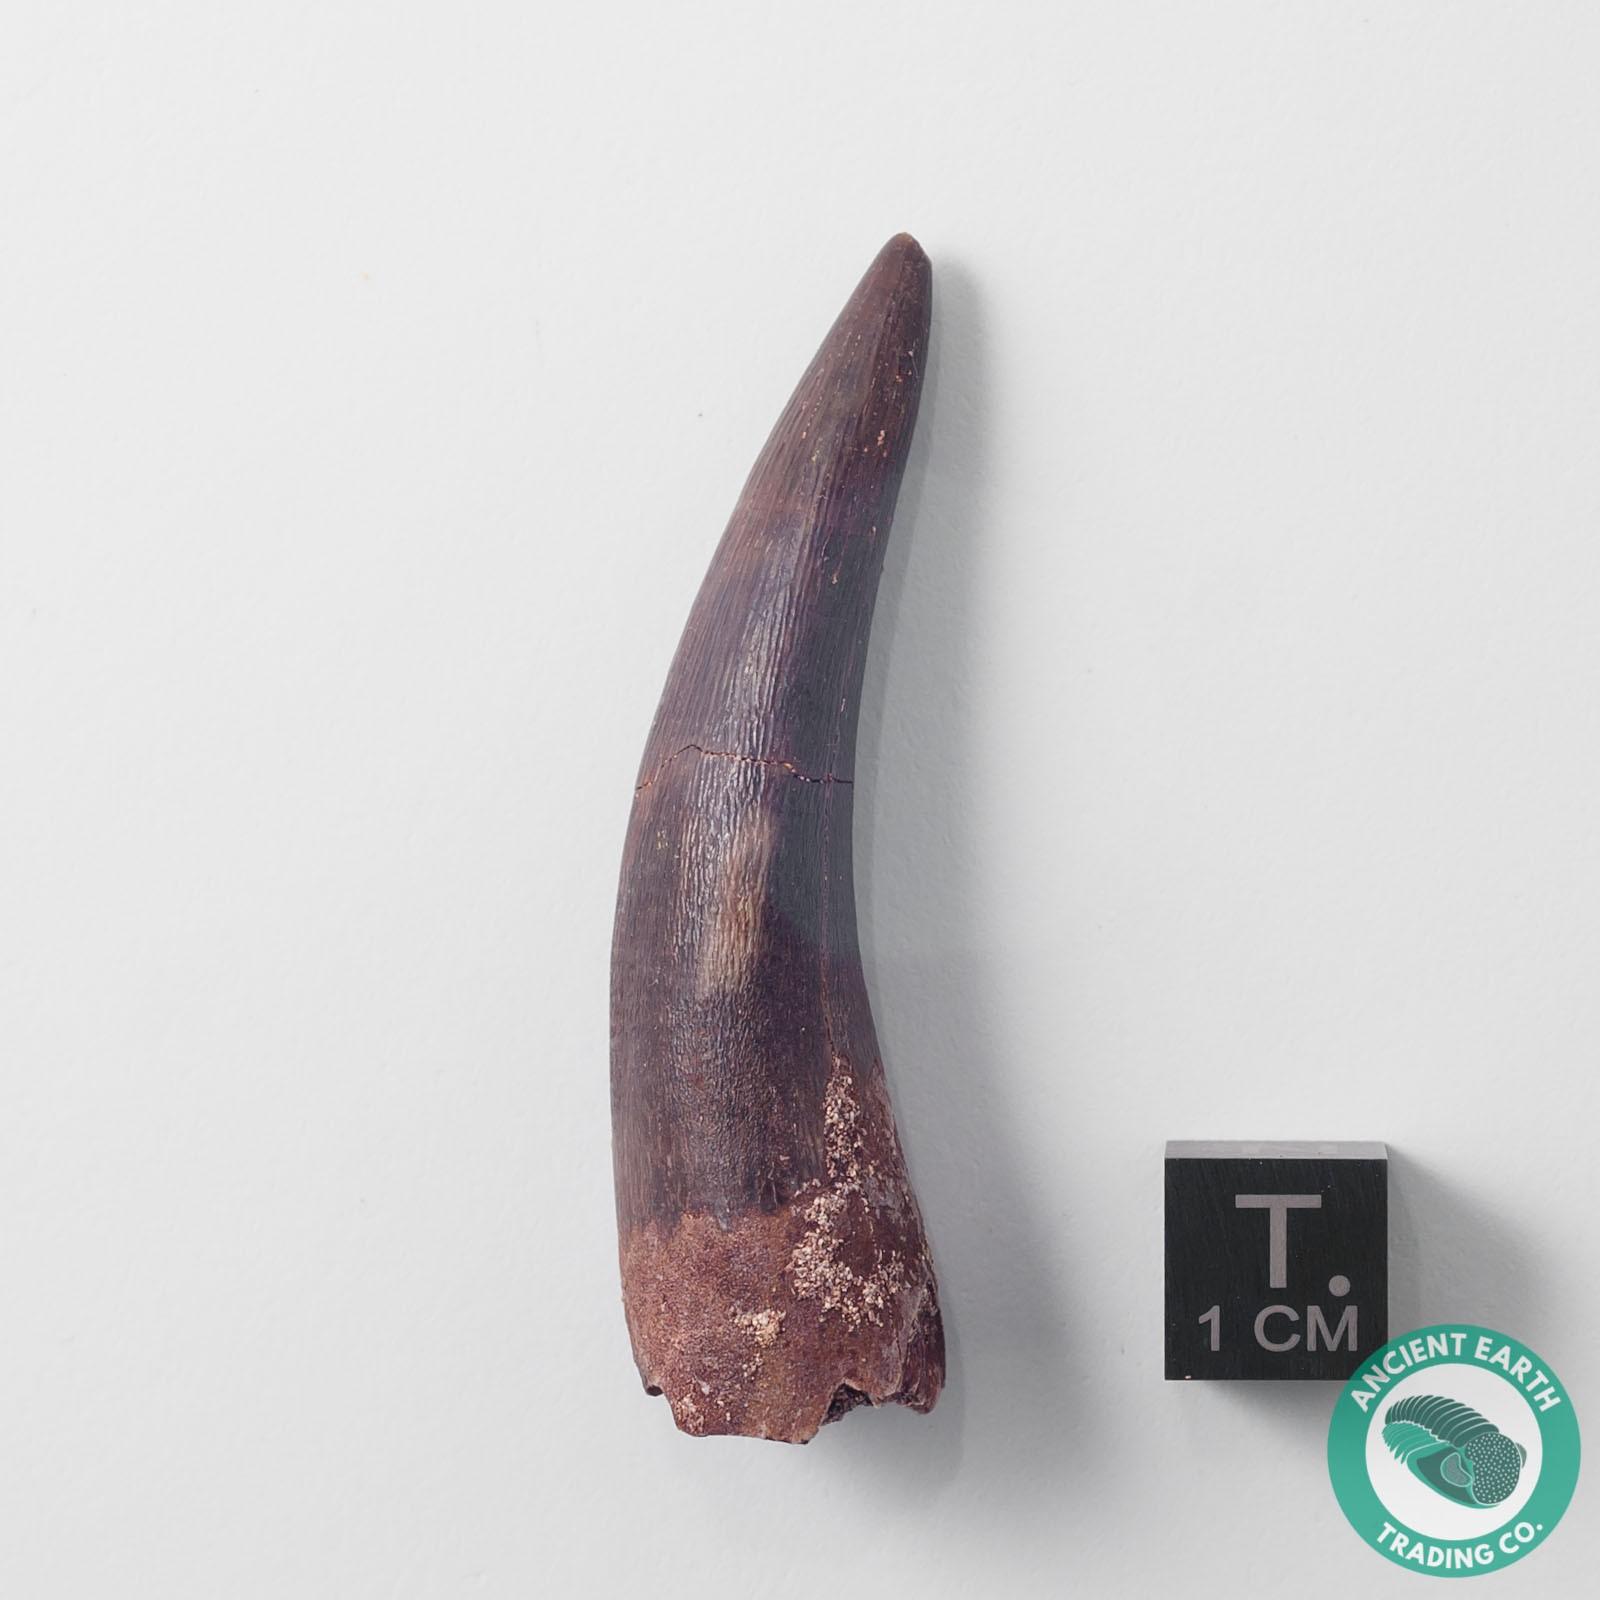 2.20 in. Plesiosaur Zarafasaura Fossil Tooth - Morocco